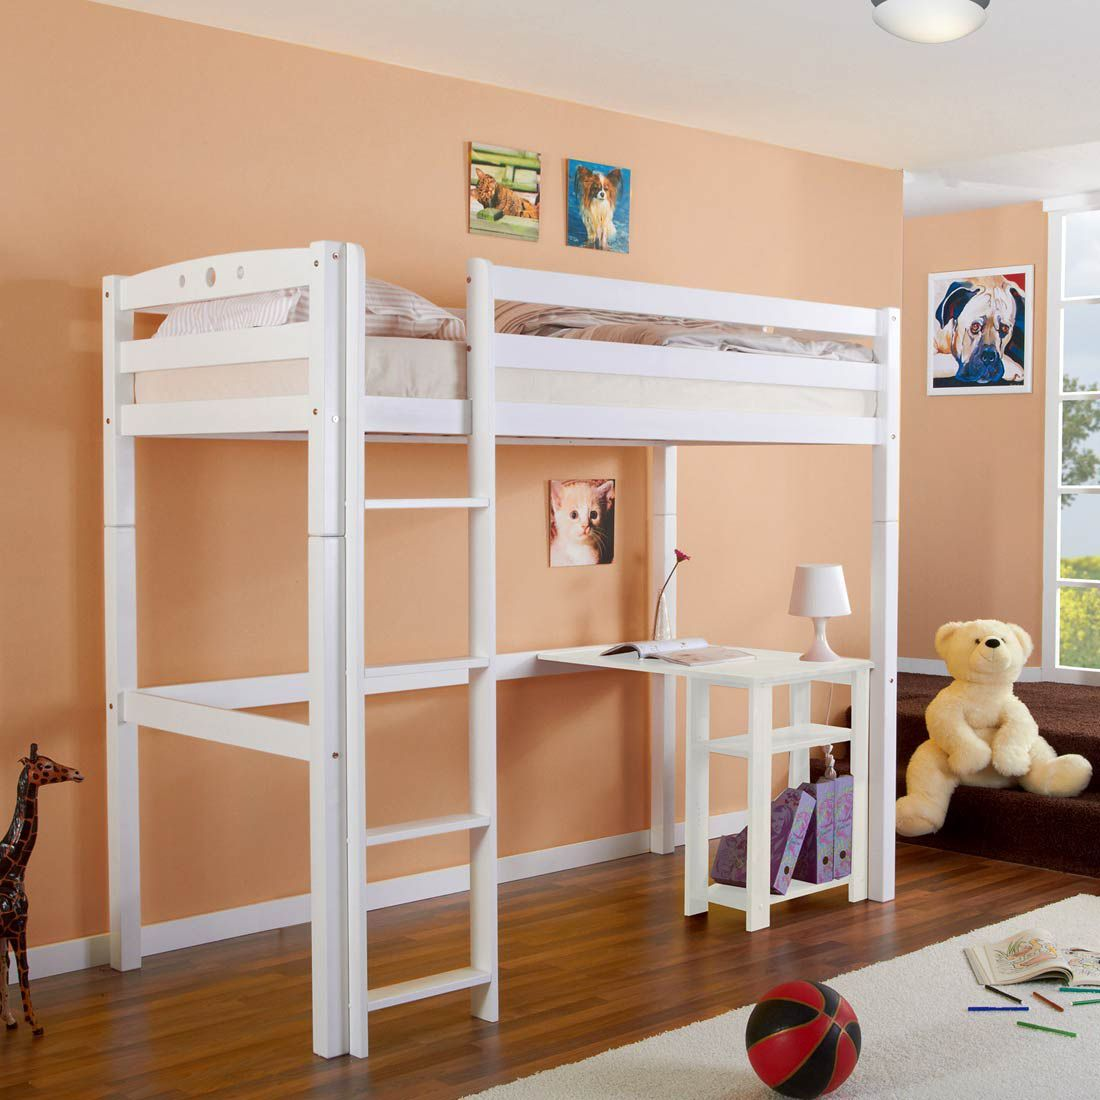 hochbett massivholz latest etagenbett mit stauraum treppen schnsten with hochbett massivholz. Black Bedroom Furniture Sets. Home Design Ideas